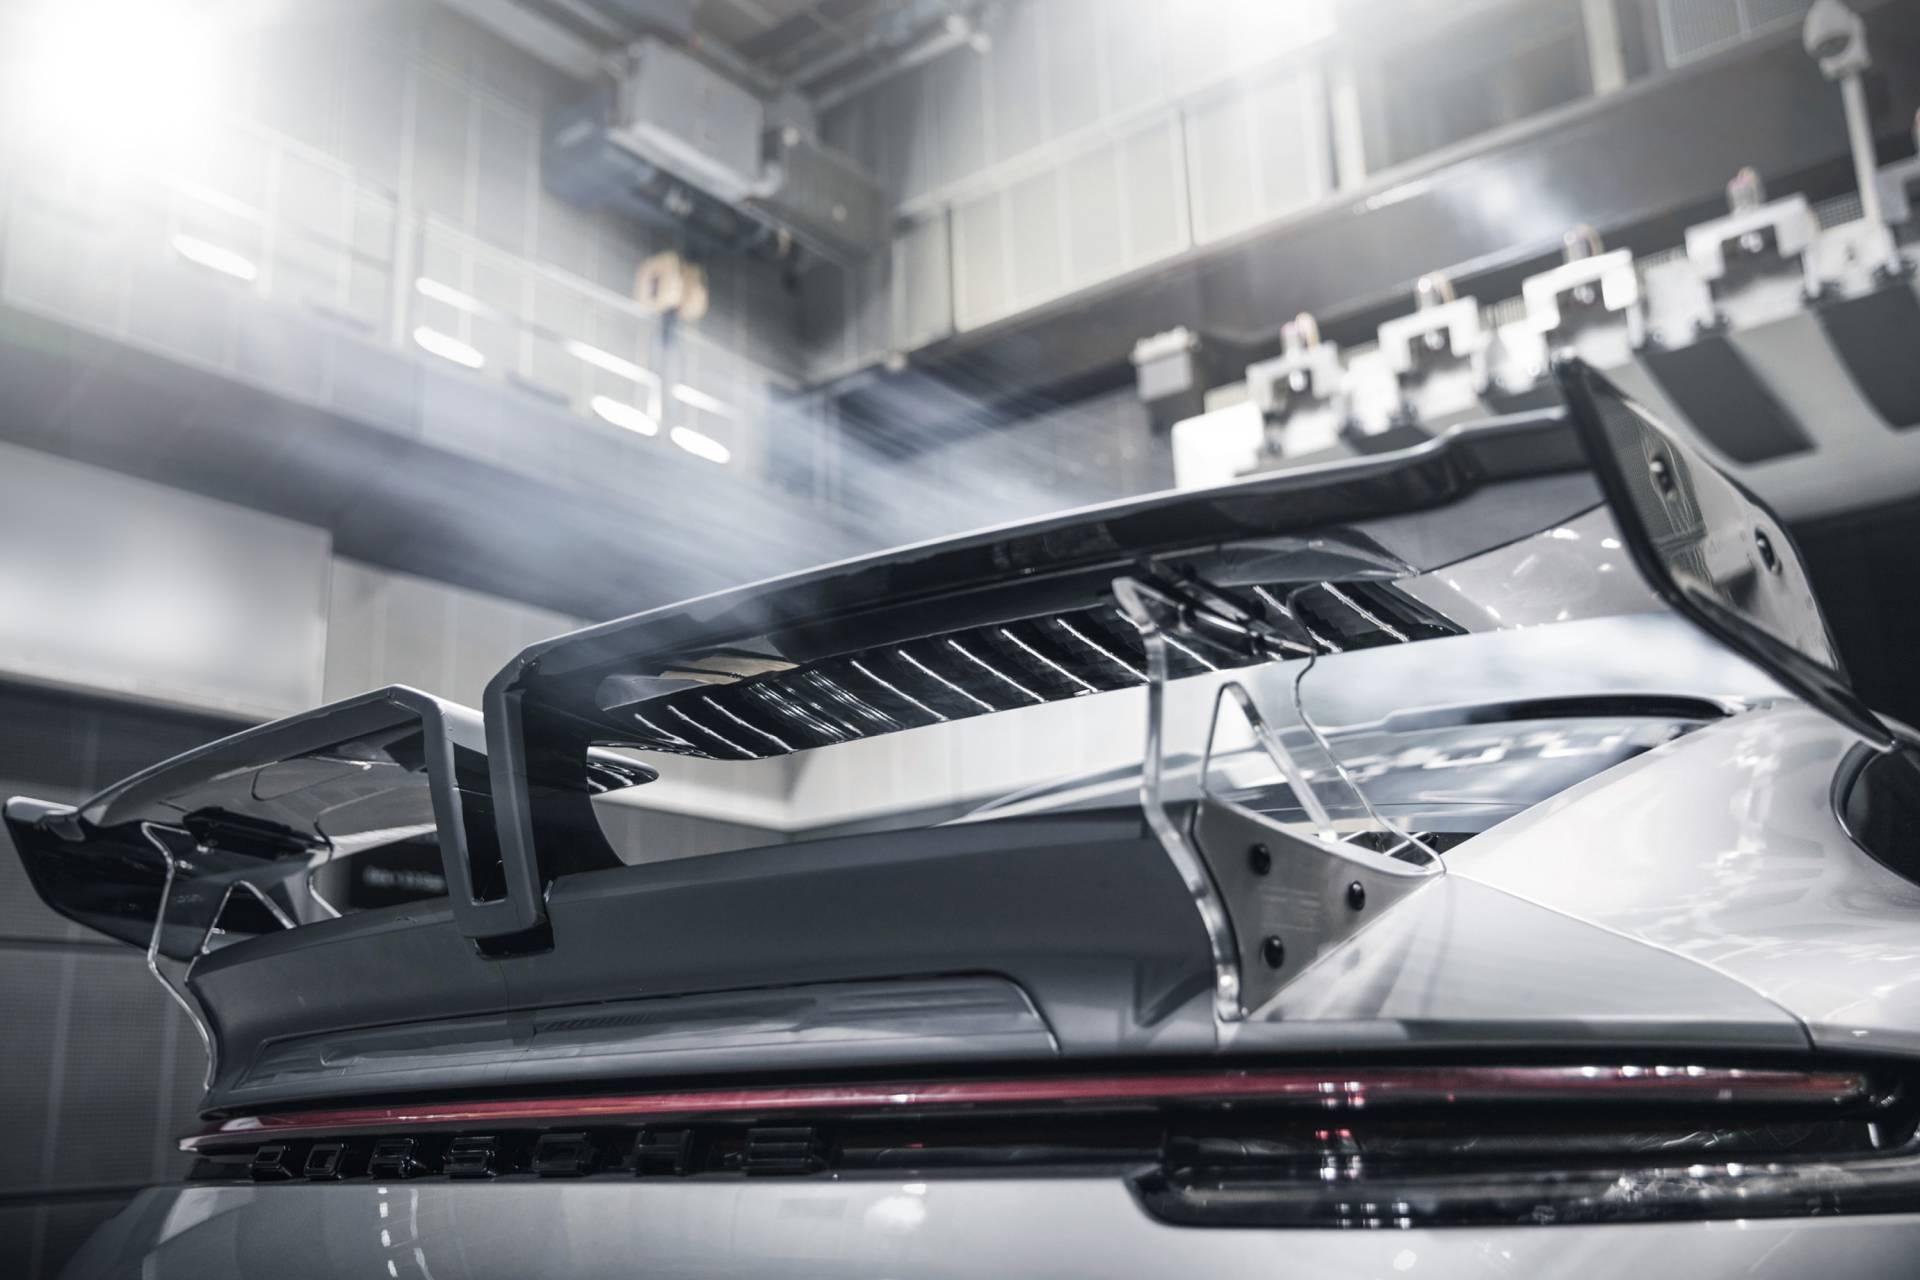 Chi tiet Porsche 911 2020 lot xac man nhan voi goi do thu cong hinh anh 24